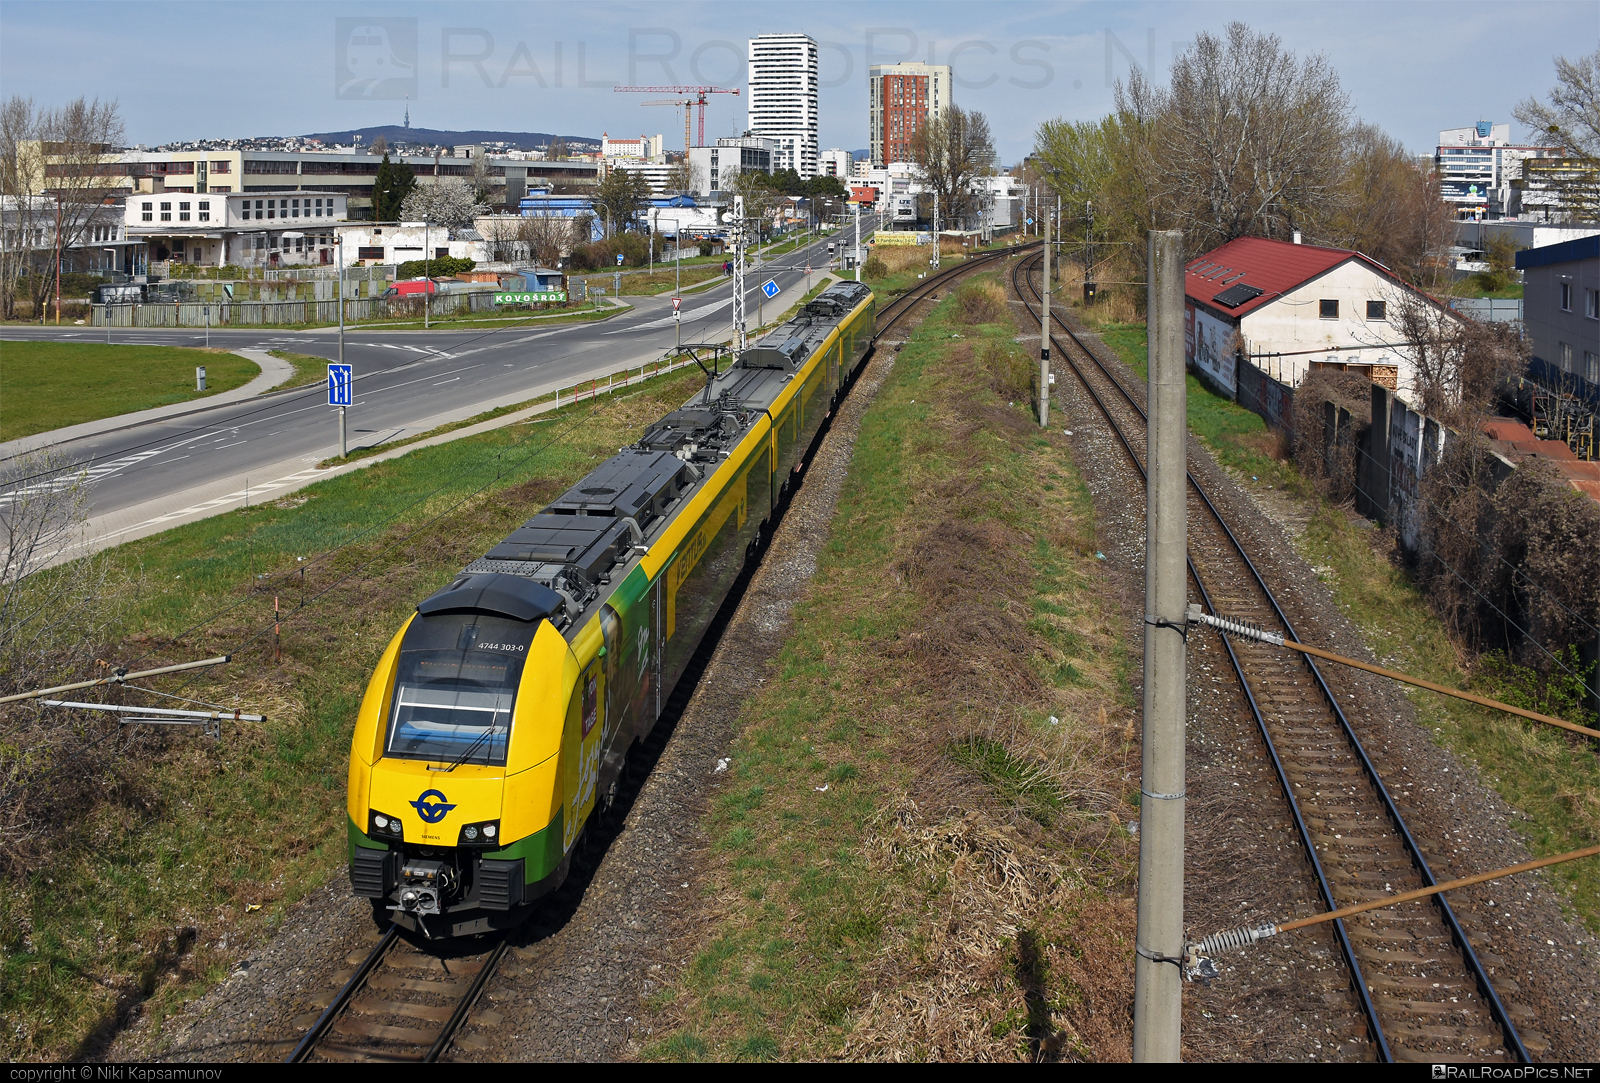 Siemens Desiro ML - 4744 303-0 operated by GYSEV - Györ-Sopron-Ebenfurti Vasut Részvénytarsasag #desiro #desiroml #gyorsopronebenfurtivasutreszvenytarsasag #gysev #raaboedenburgebenfurtereisenbahn #raaboedenburgebenfurtereisenbahnag #roeee #siemens #siemensdesiro #siemensdesiroml #ventus